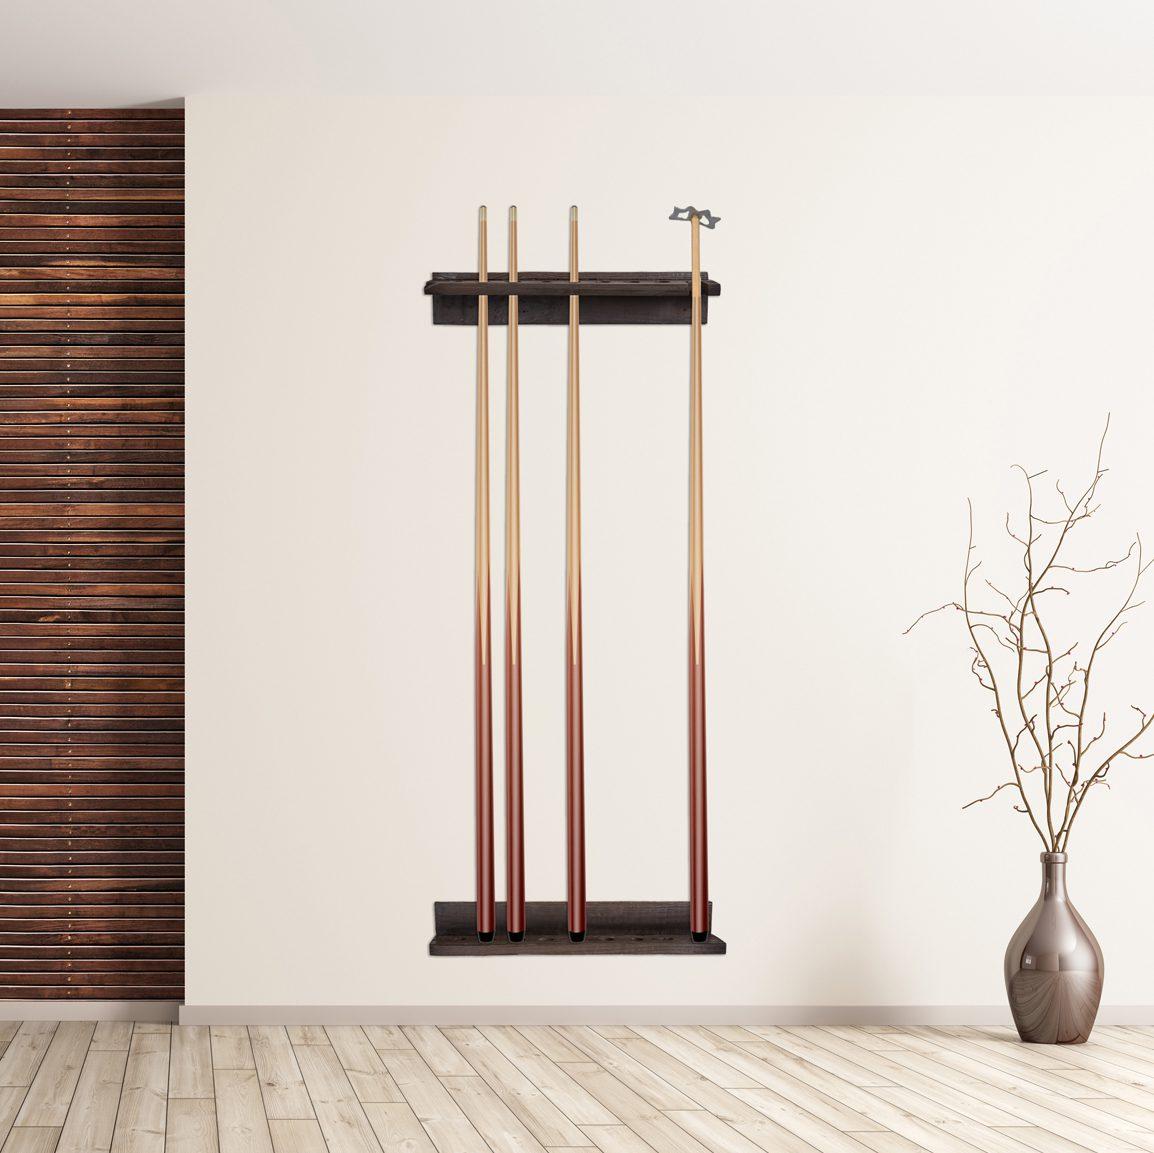 Reclaimed Wood Cue Rack in Use